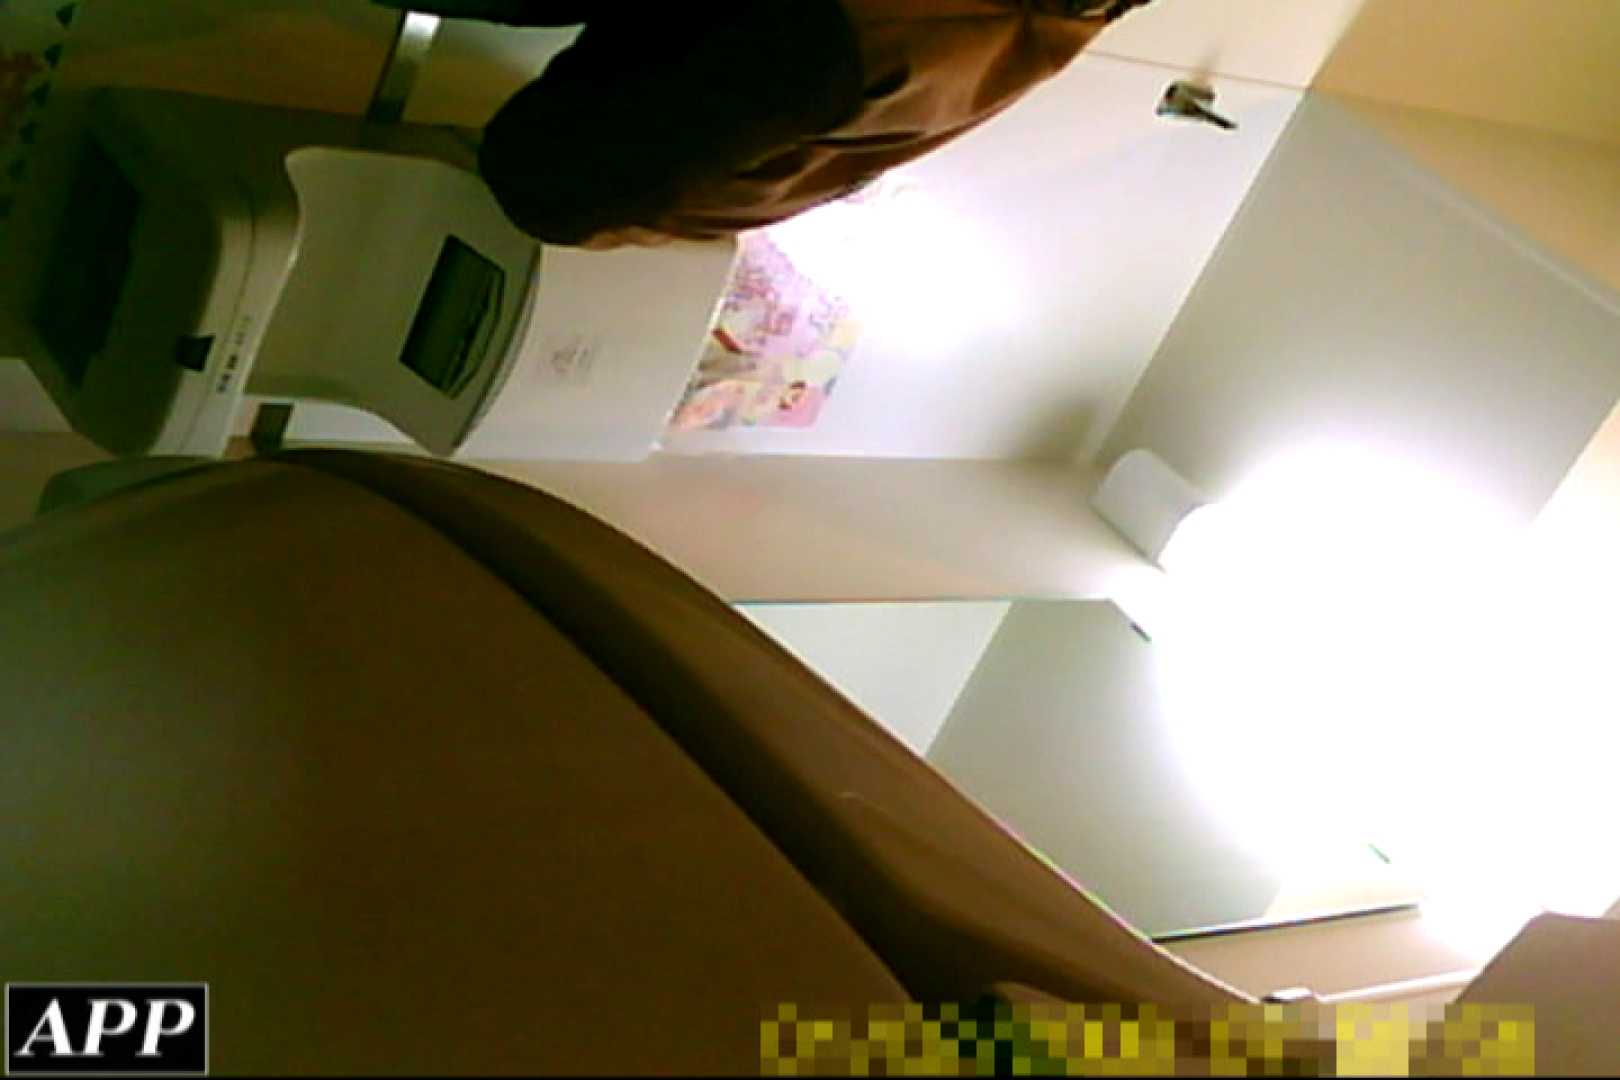 3視点洗面所 vol.02 盗撮で悶絶 セックス無修正動画無料 92画像 92